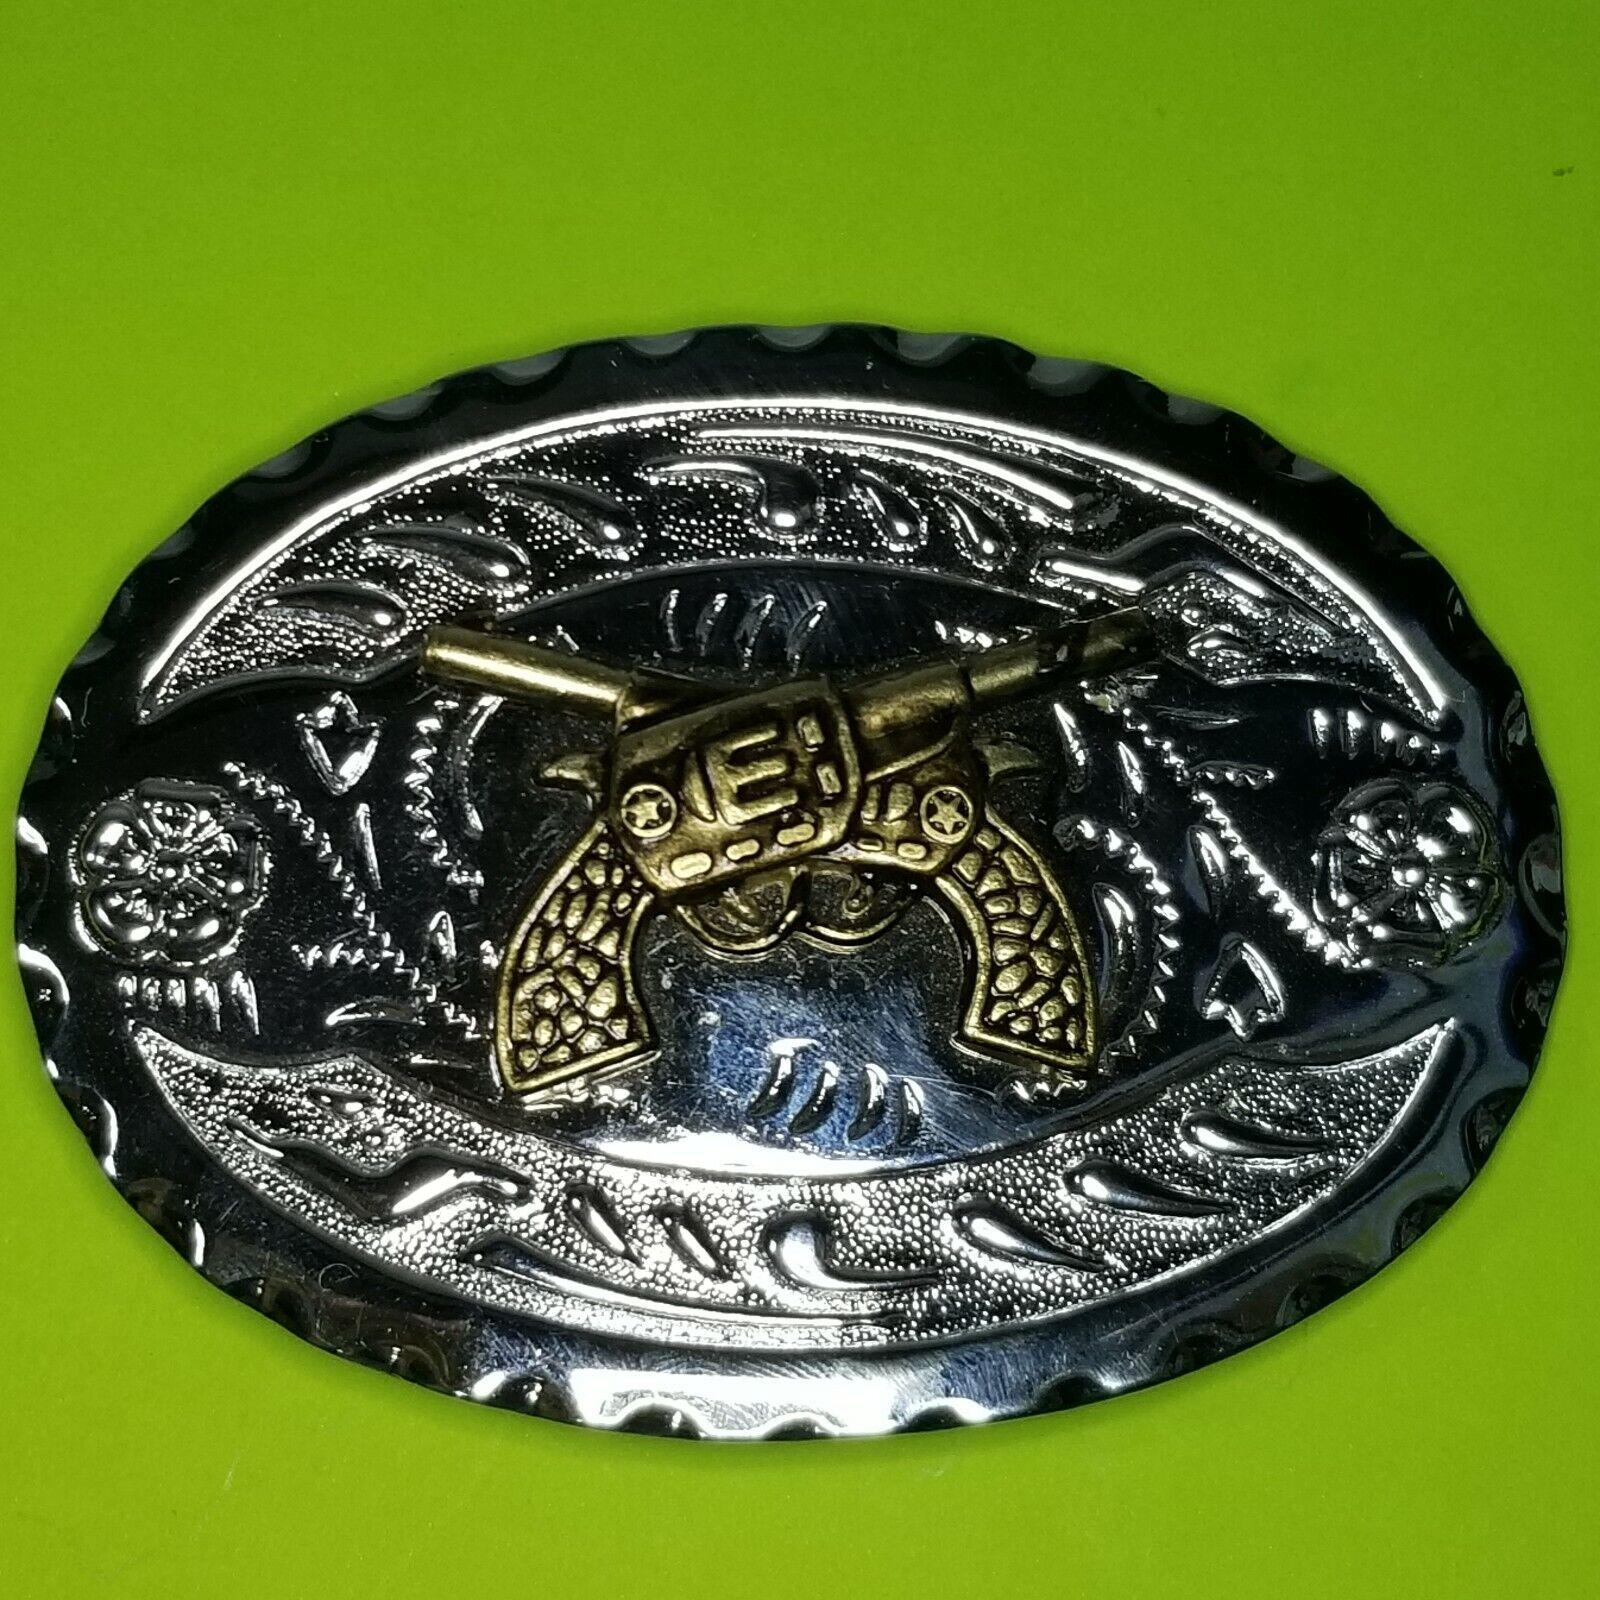 Crossed Guns Western Cowboy Belt Buckle Firearms Pistols Mixed Metal Stamped